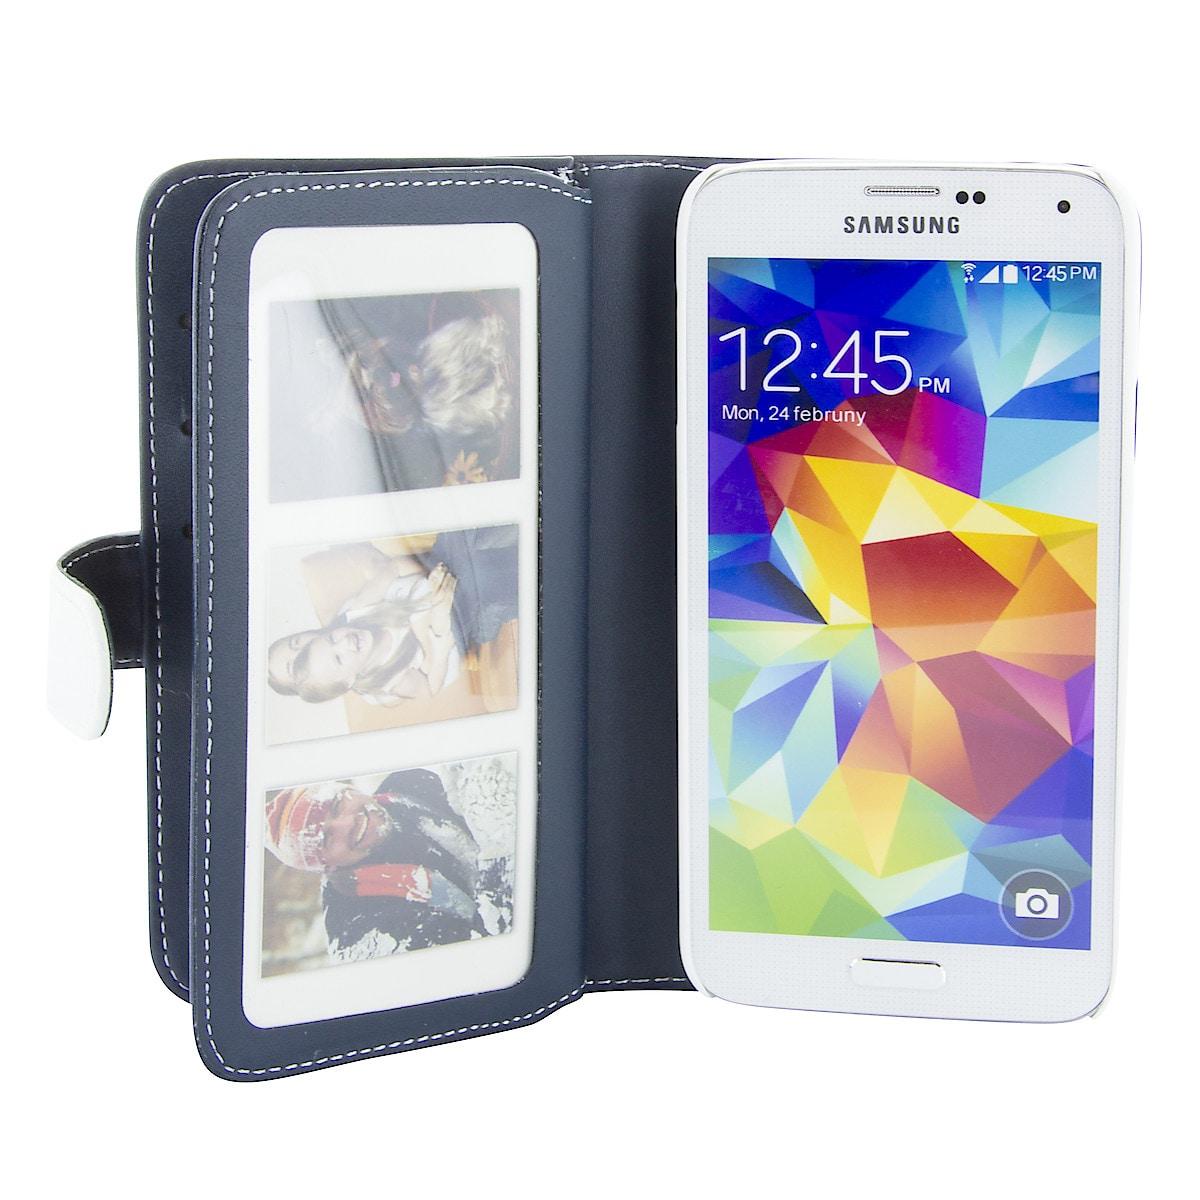 Plånboksfodral XL för Samsung Galaxy S5, Holdit